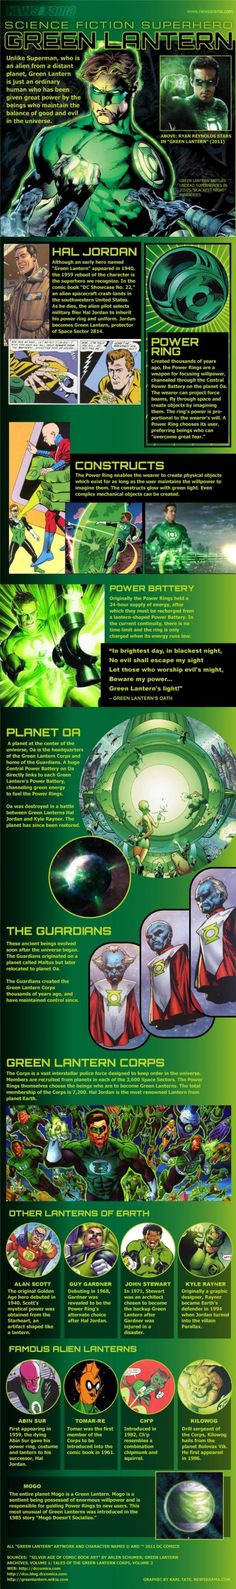 Science Fiction Superhero: Green Lantern